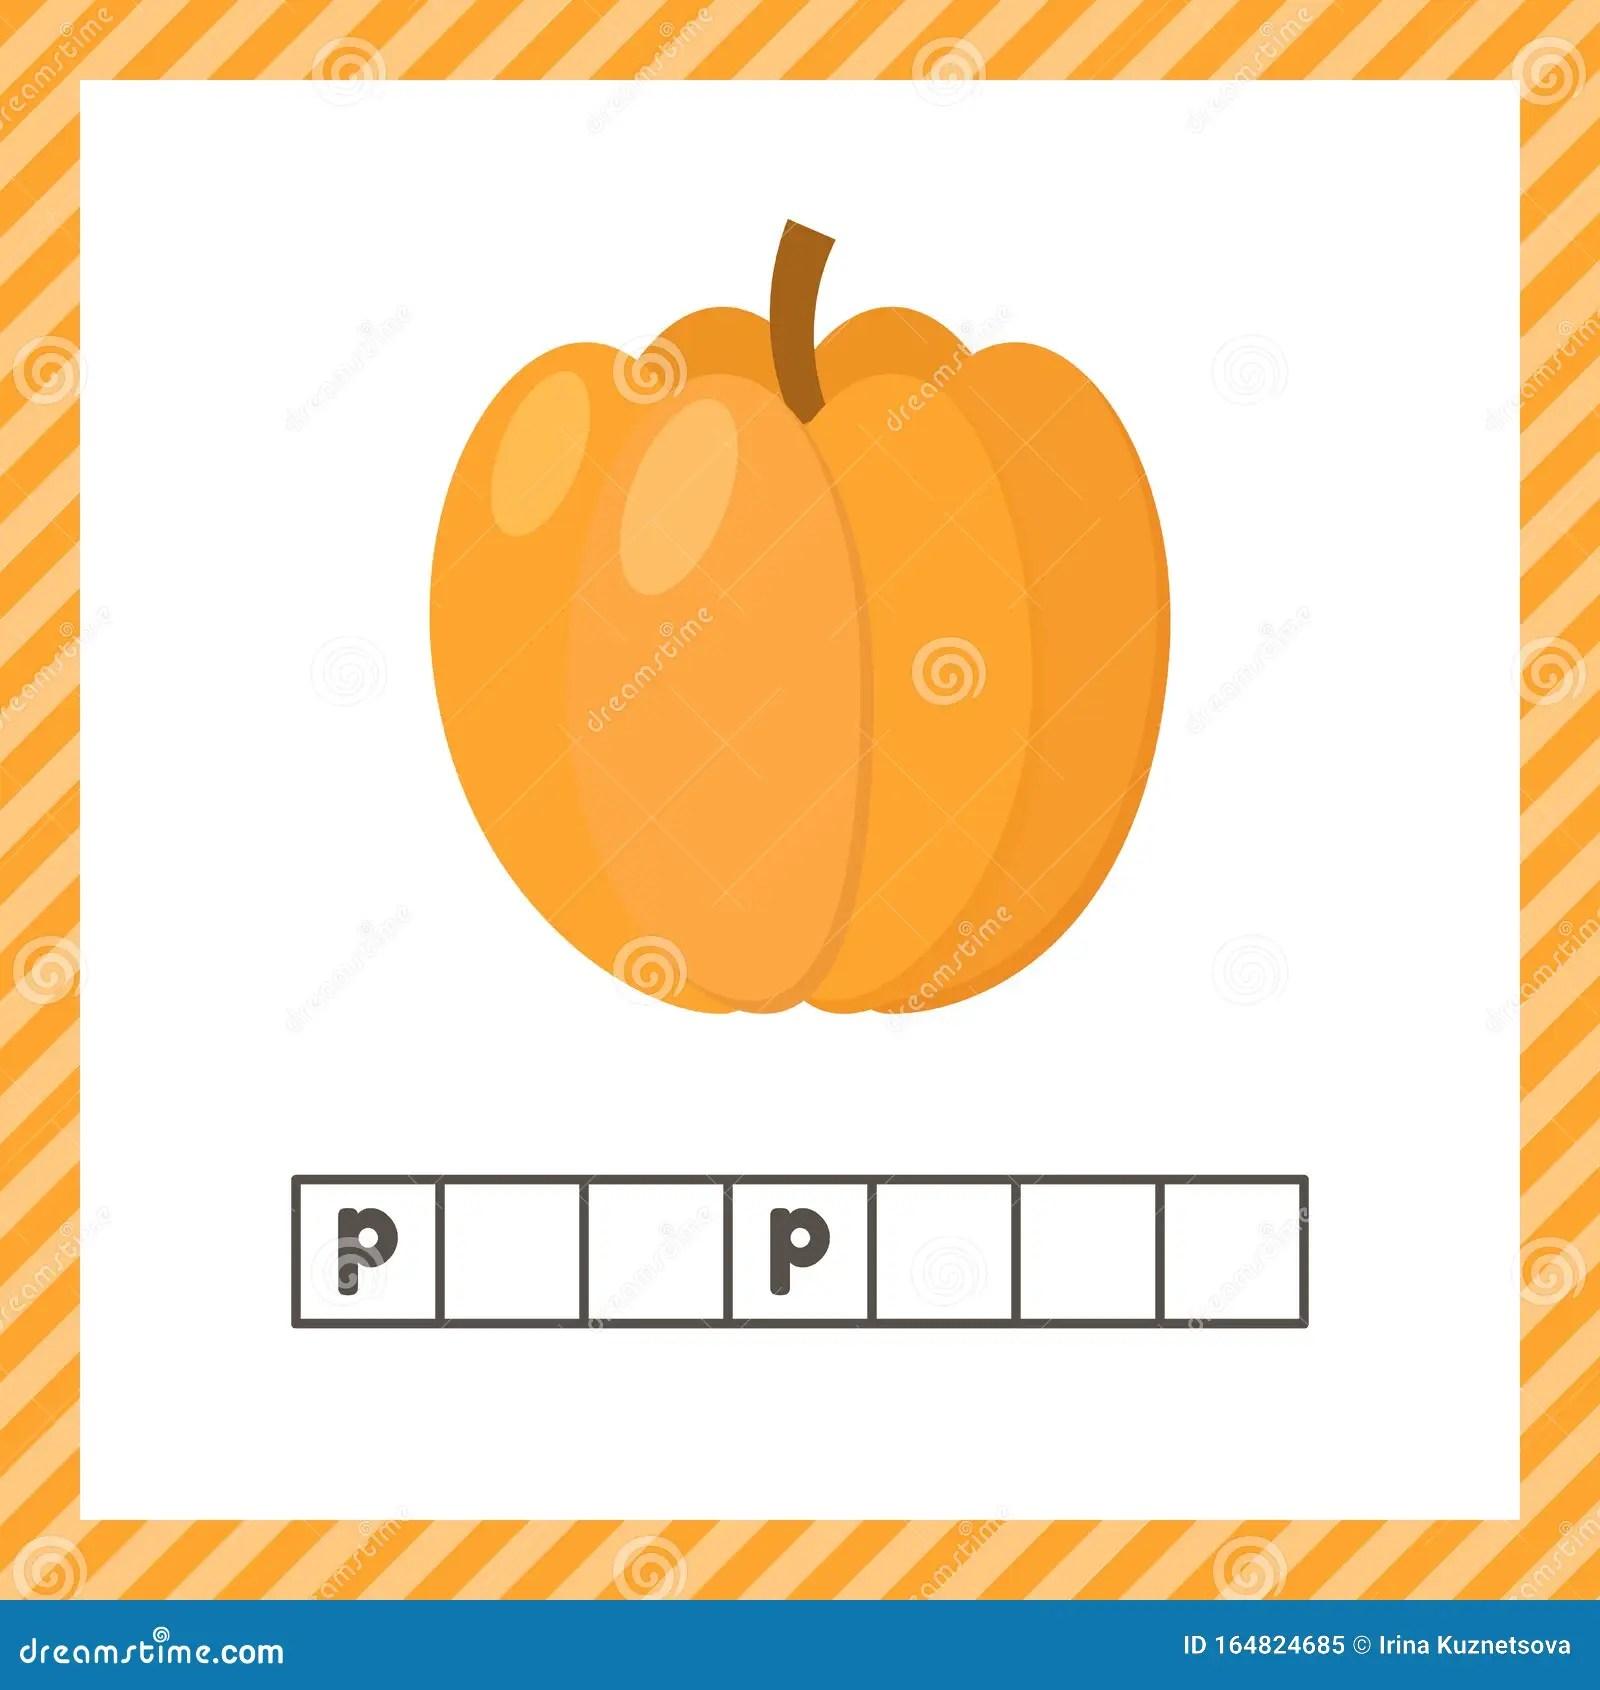 Vegetable Pumpkin Educational Logic Worksheet For